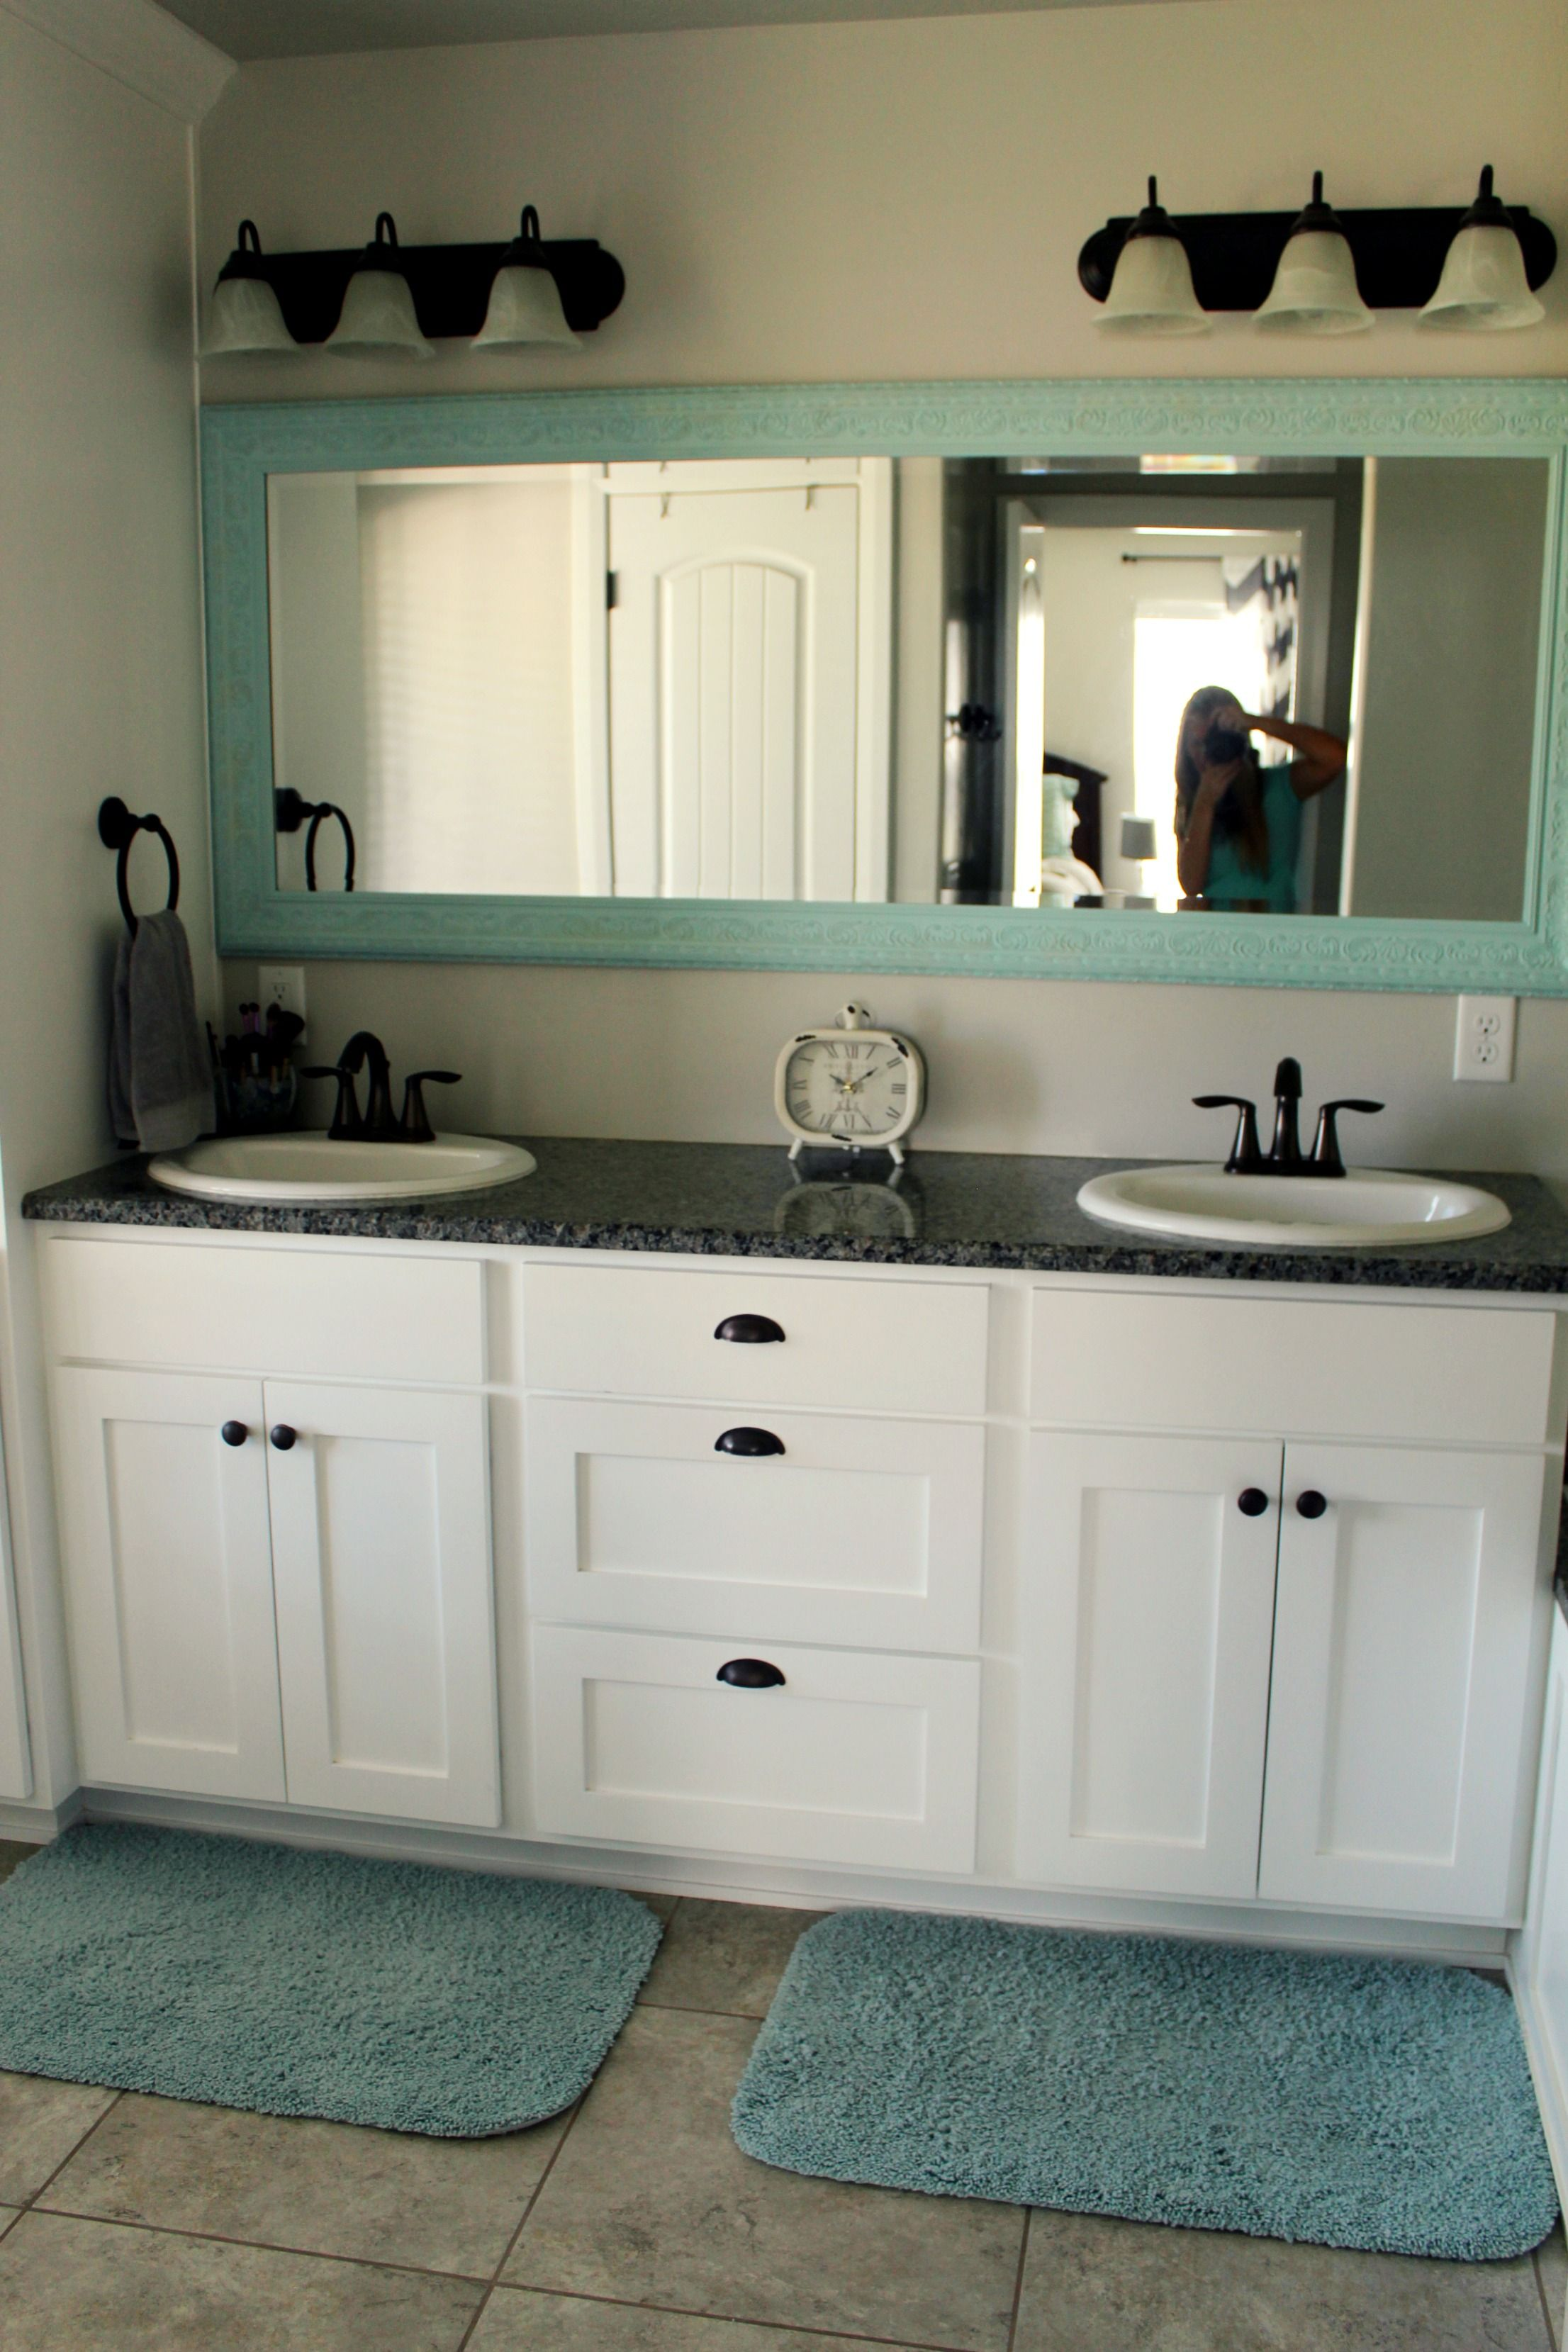 a spa-like master bathroom | Aqua Lane Design | MASTER BATH ... on